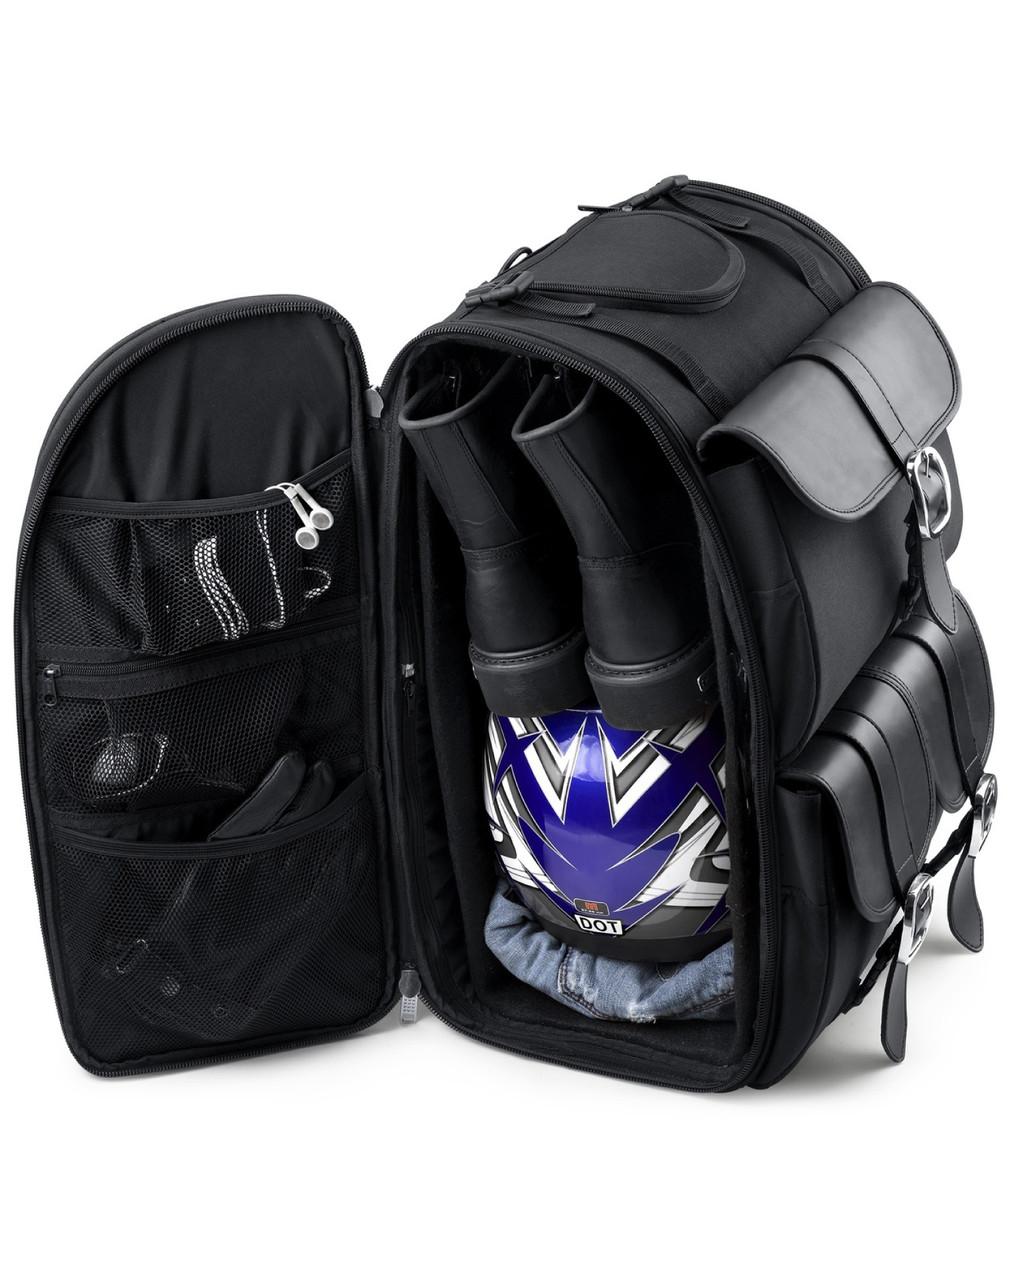 Honda Viking Extra Large Plain Motorcycle Sissy Bar Bag Storage View